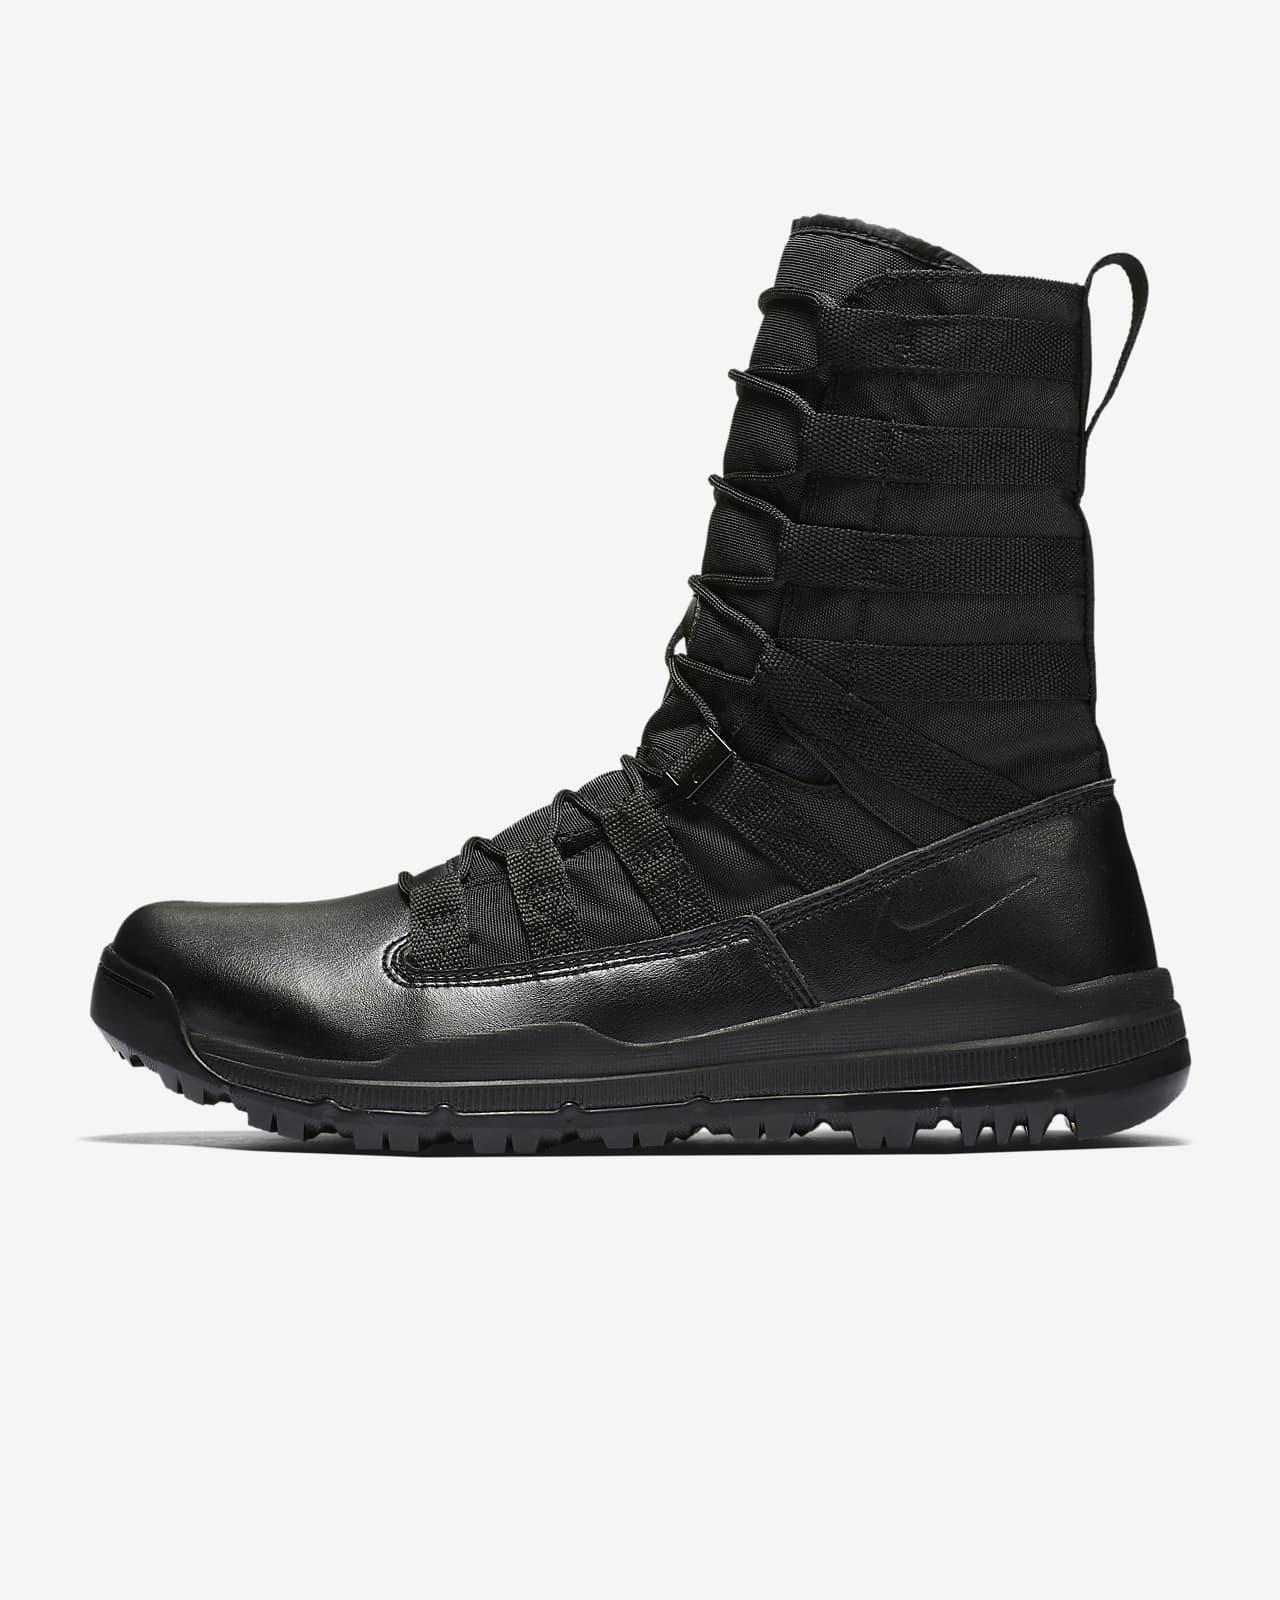 "Nike SFB Gen 2 8"" Tactical Boot"